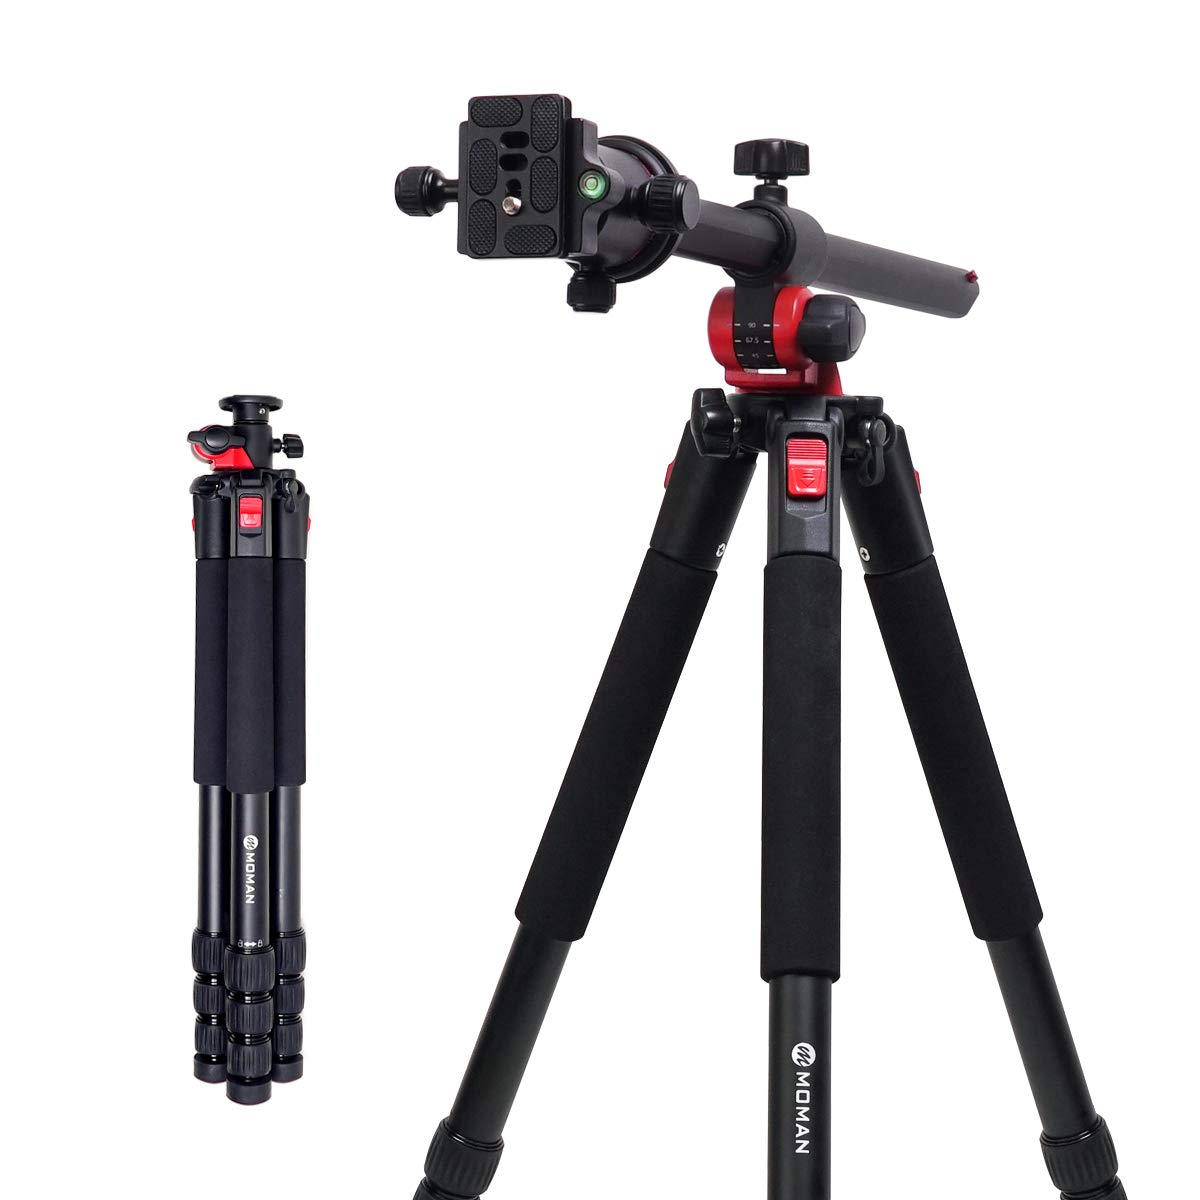 Moman Camera Tripod with Telescopic Horizontal Column Arm and Ball Head for Macro Shoot/Overhead Photography/Travel / DSLR Camera Video Camcorder